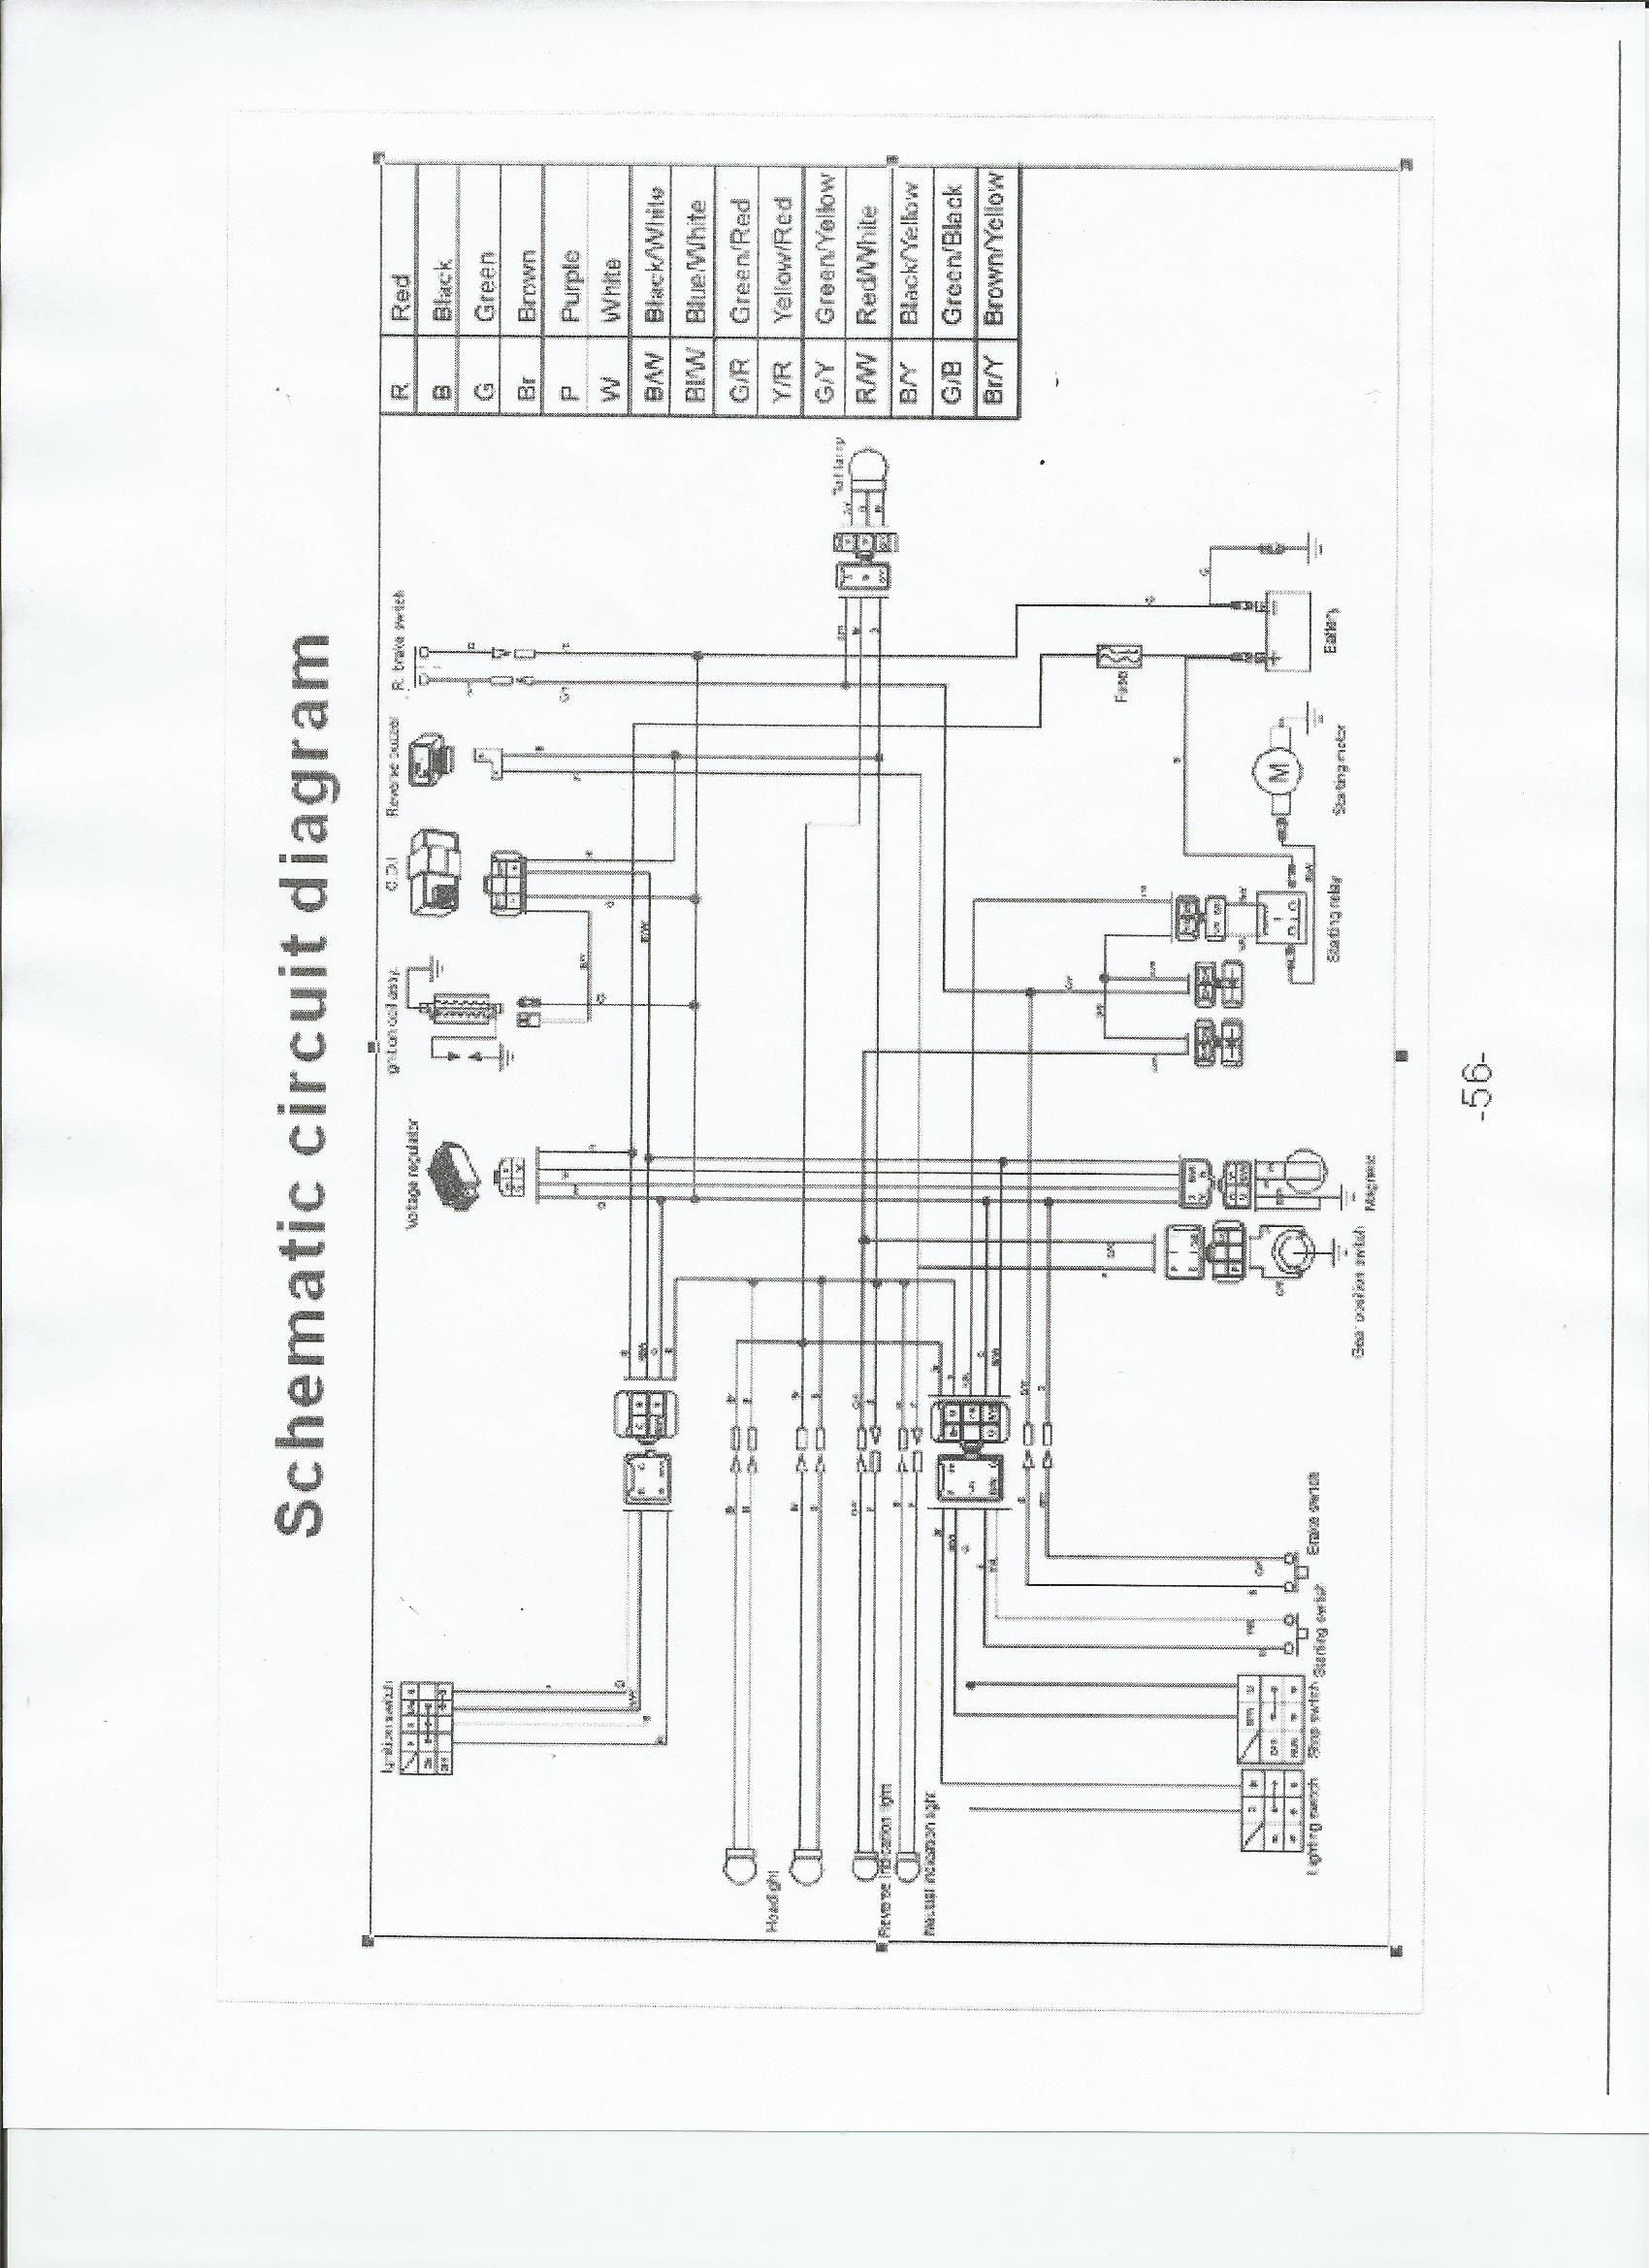 Wiring Diagram Furthermore Hensim Atv Wiring Diagram On Honda 350 Atv